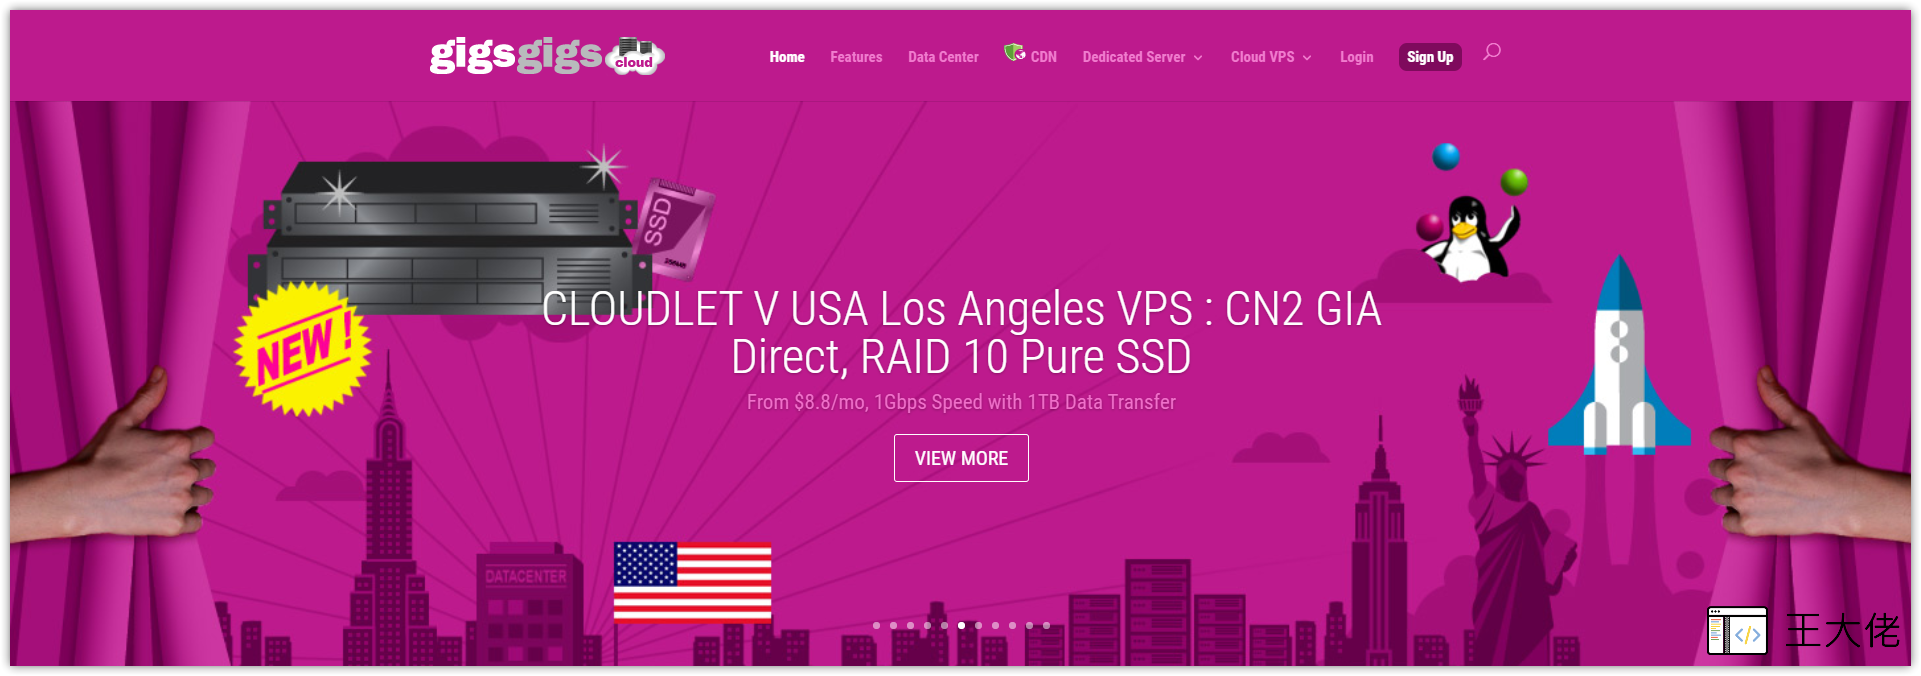 GigsGigsCloud 美国 CN2 GIA VPS 测评与注册购买教程